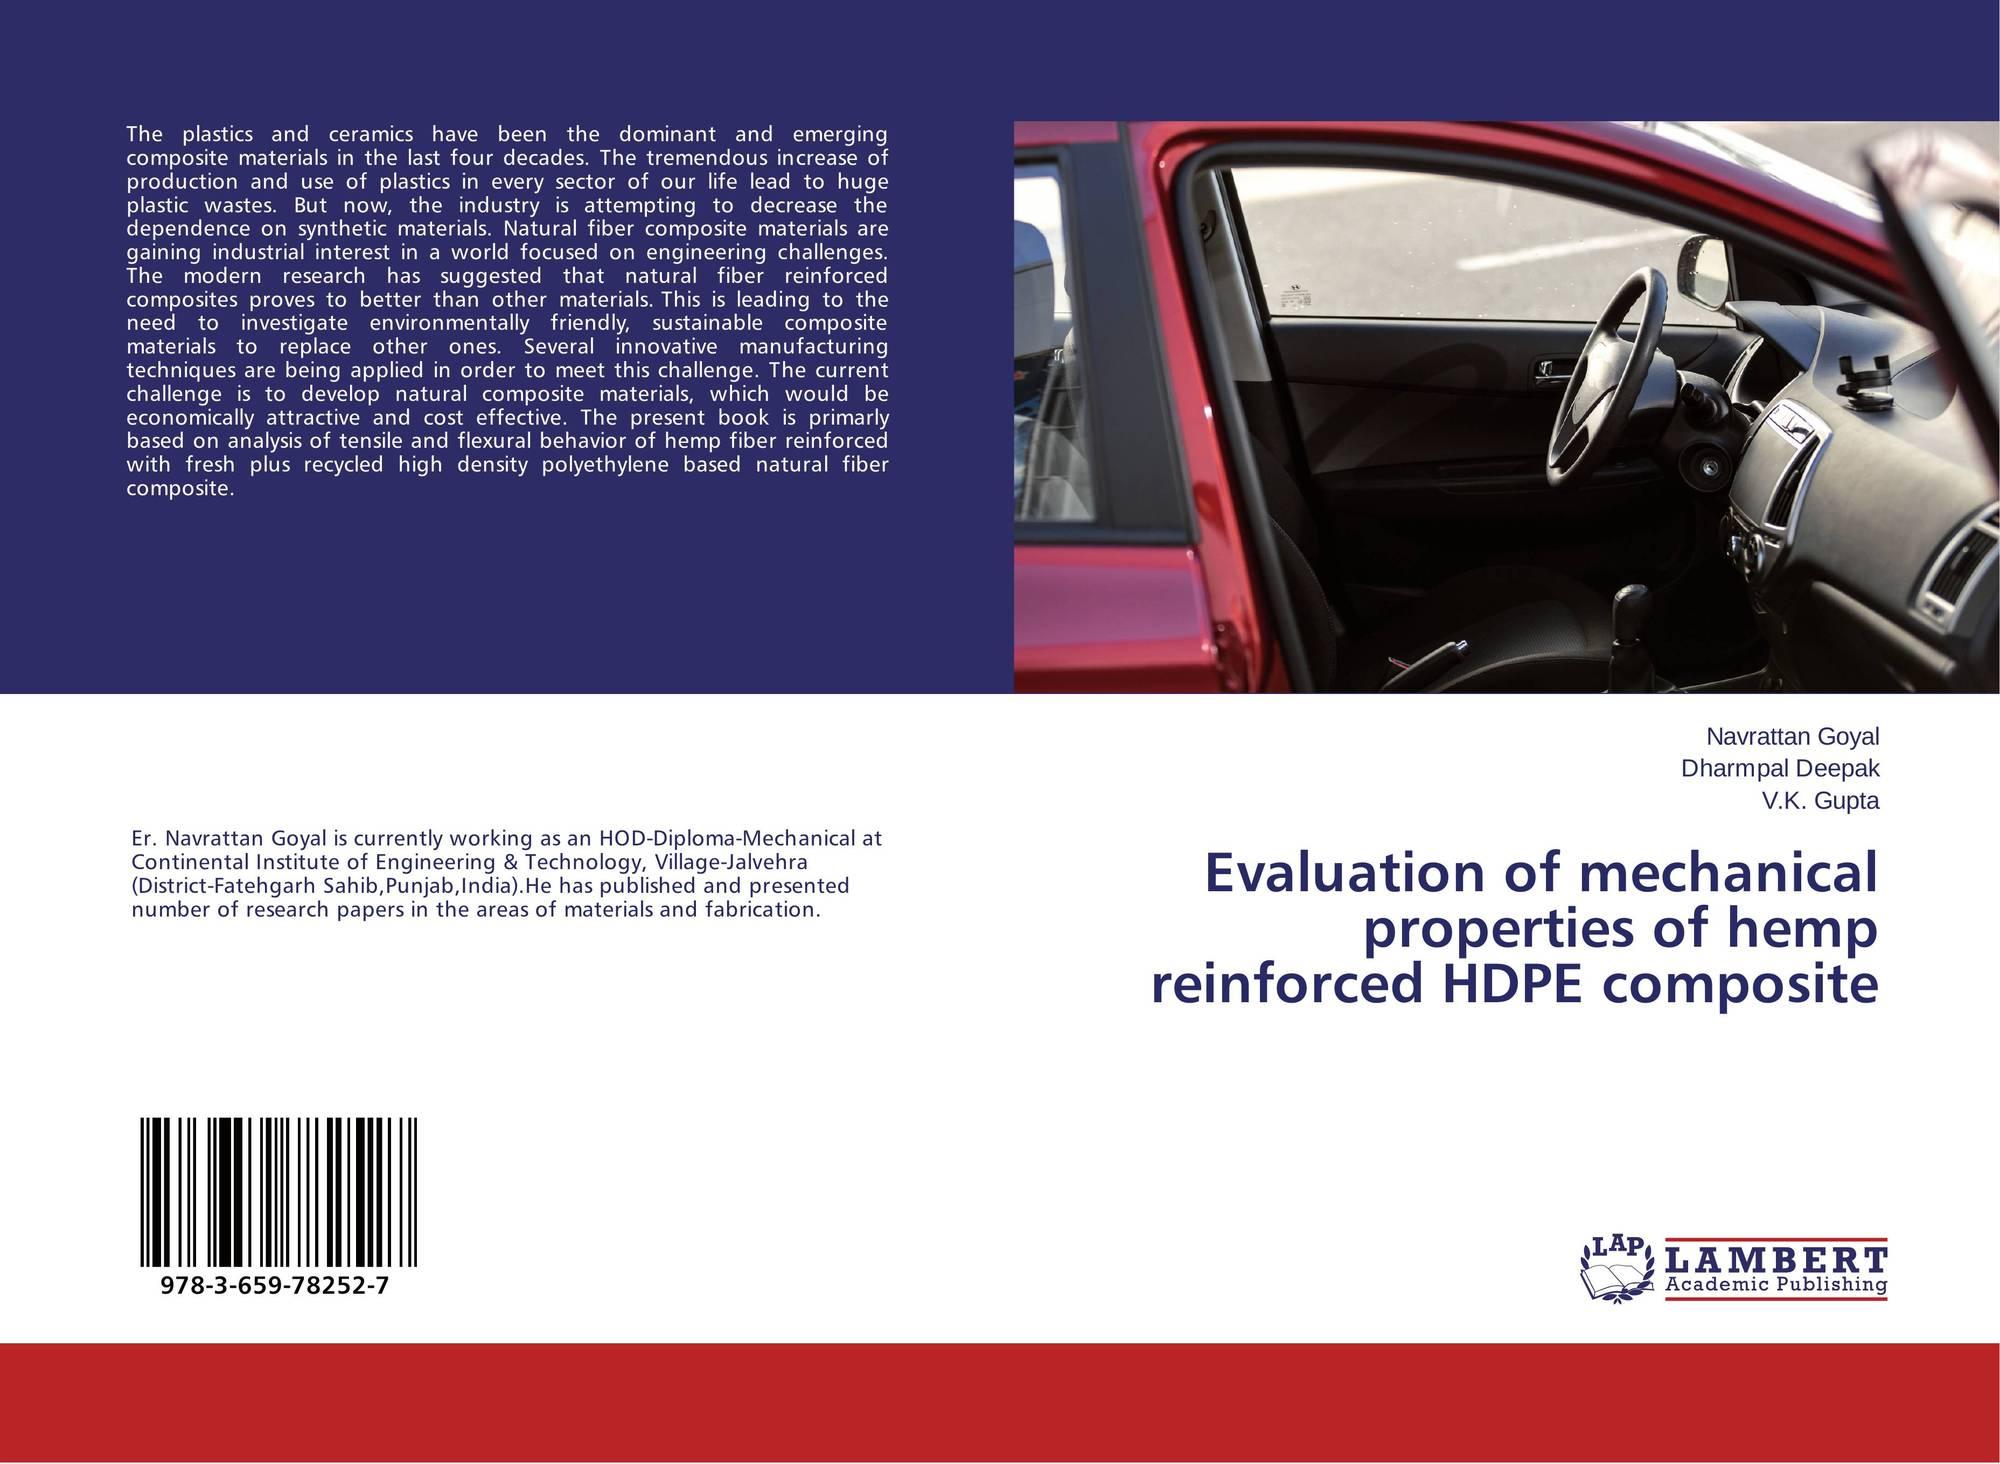 Evaluation of mechanical properties of hemp reinforced HDPE